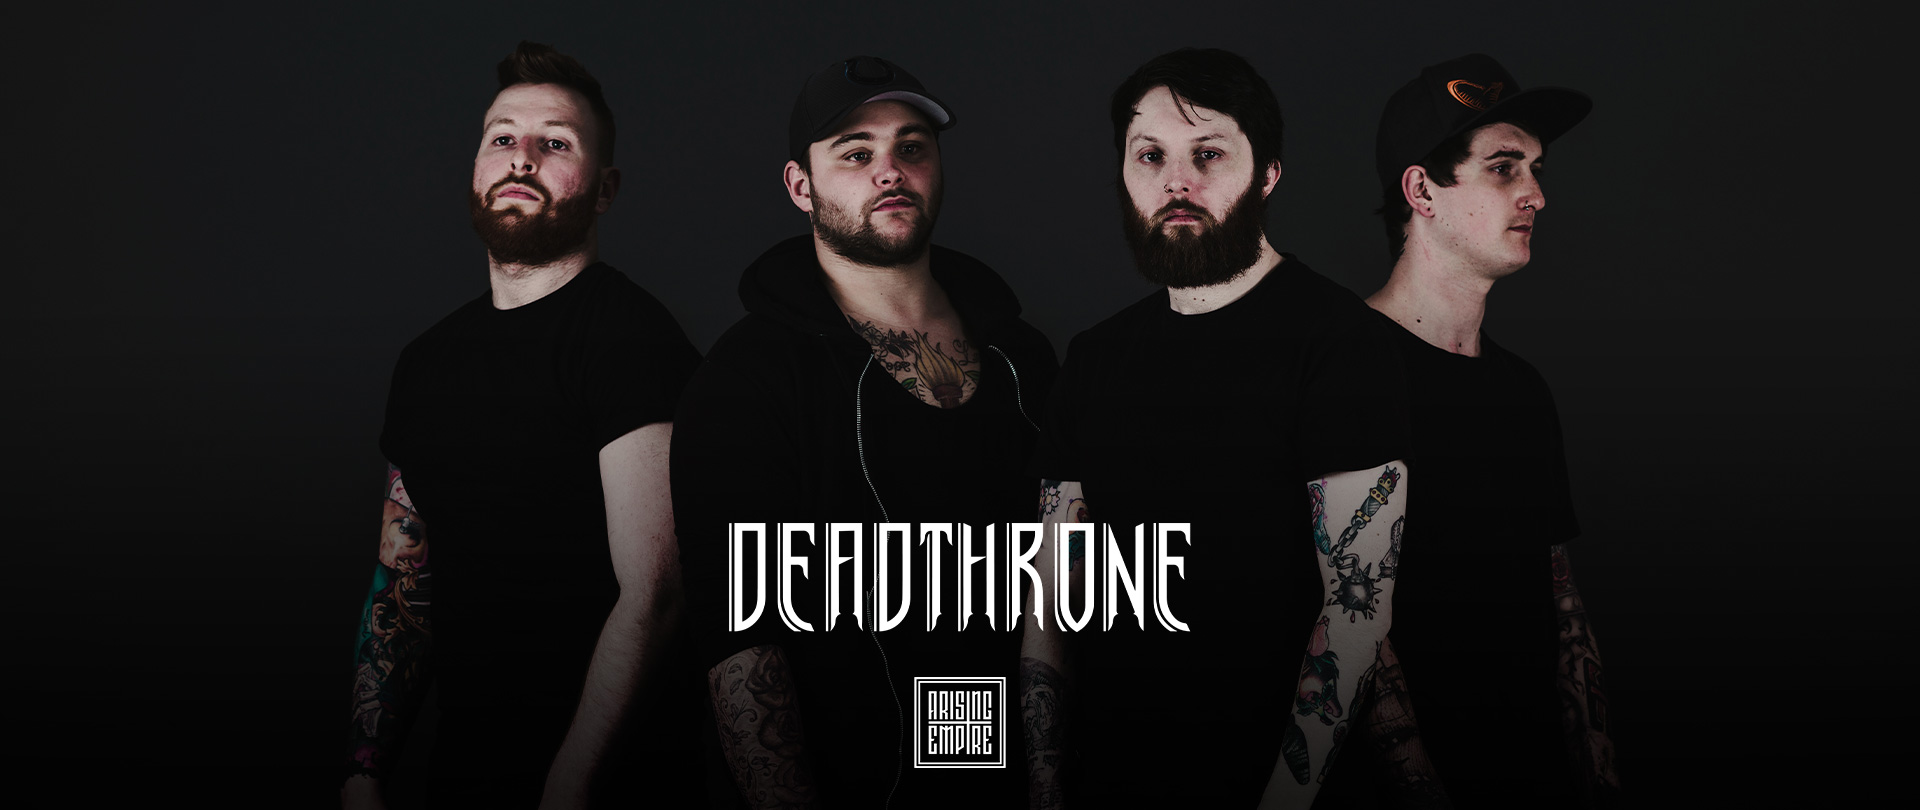 Deadthrone at Arising Empire • Official Online Shop / EN